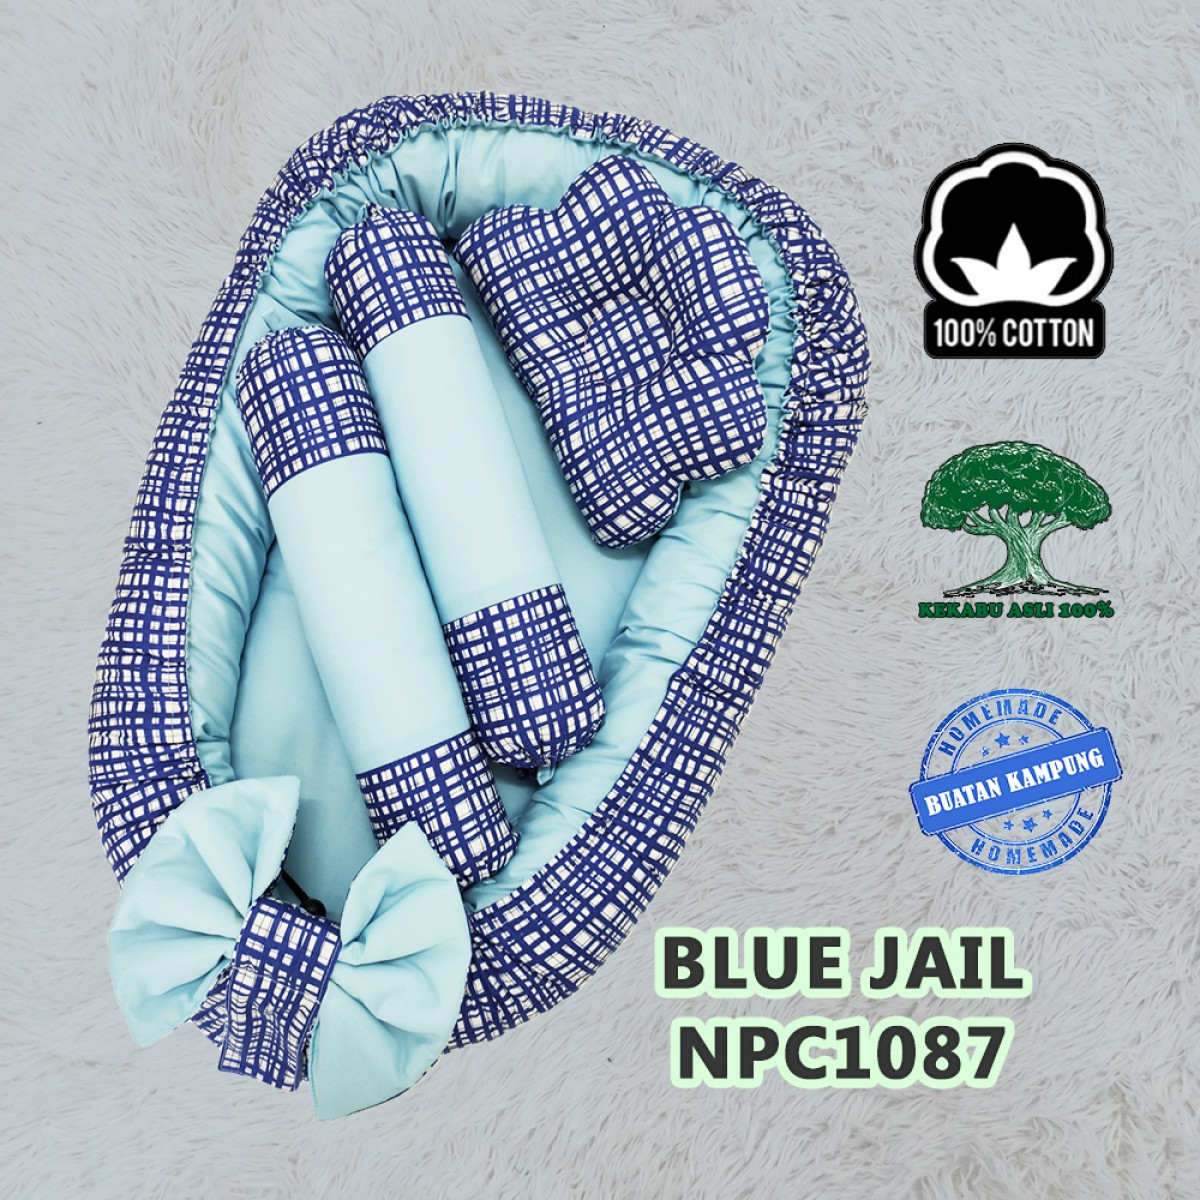 Blue Jail - Kico Baby Center